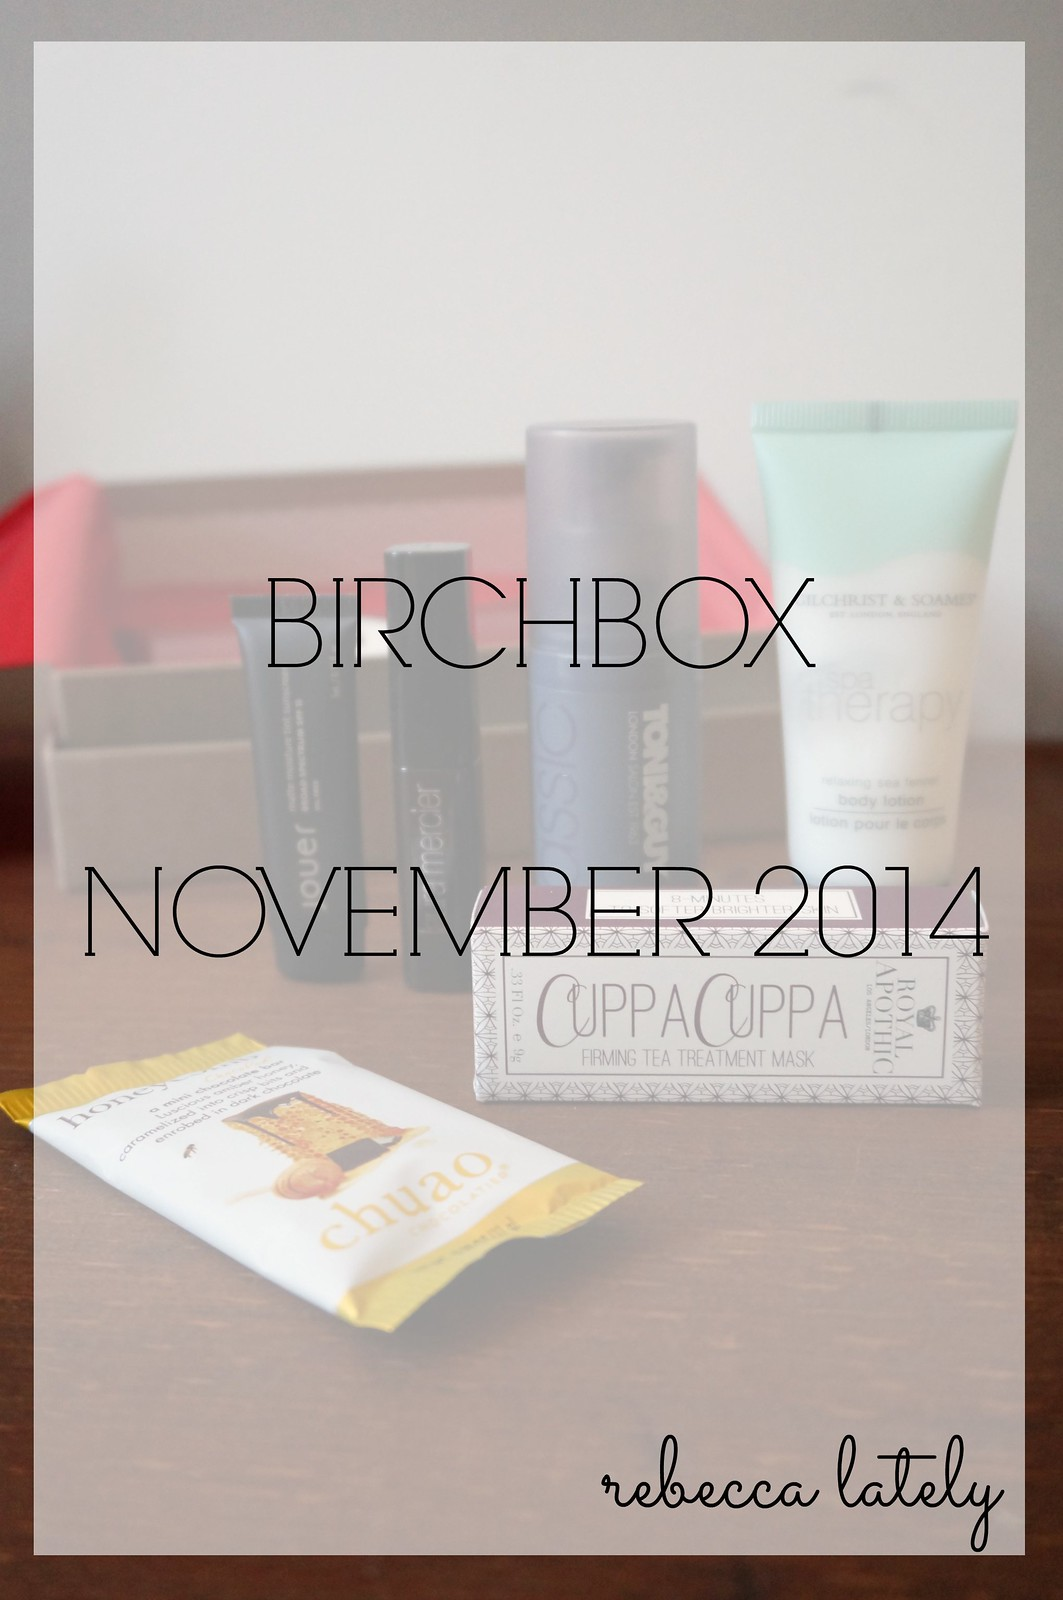 Birchbox November 2014 2